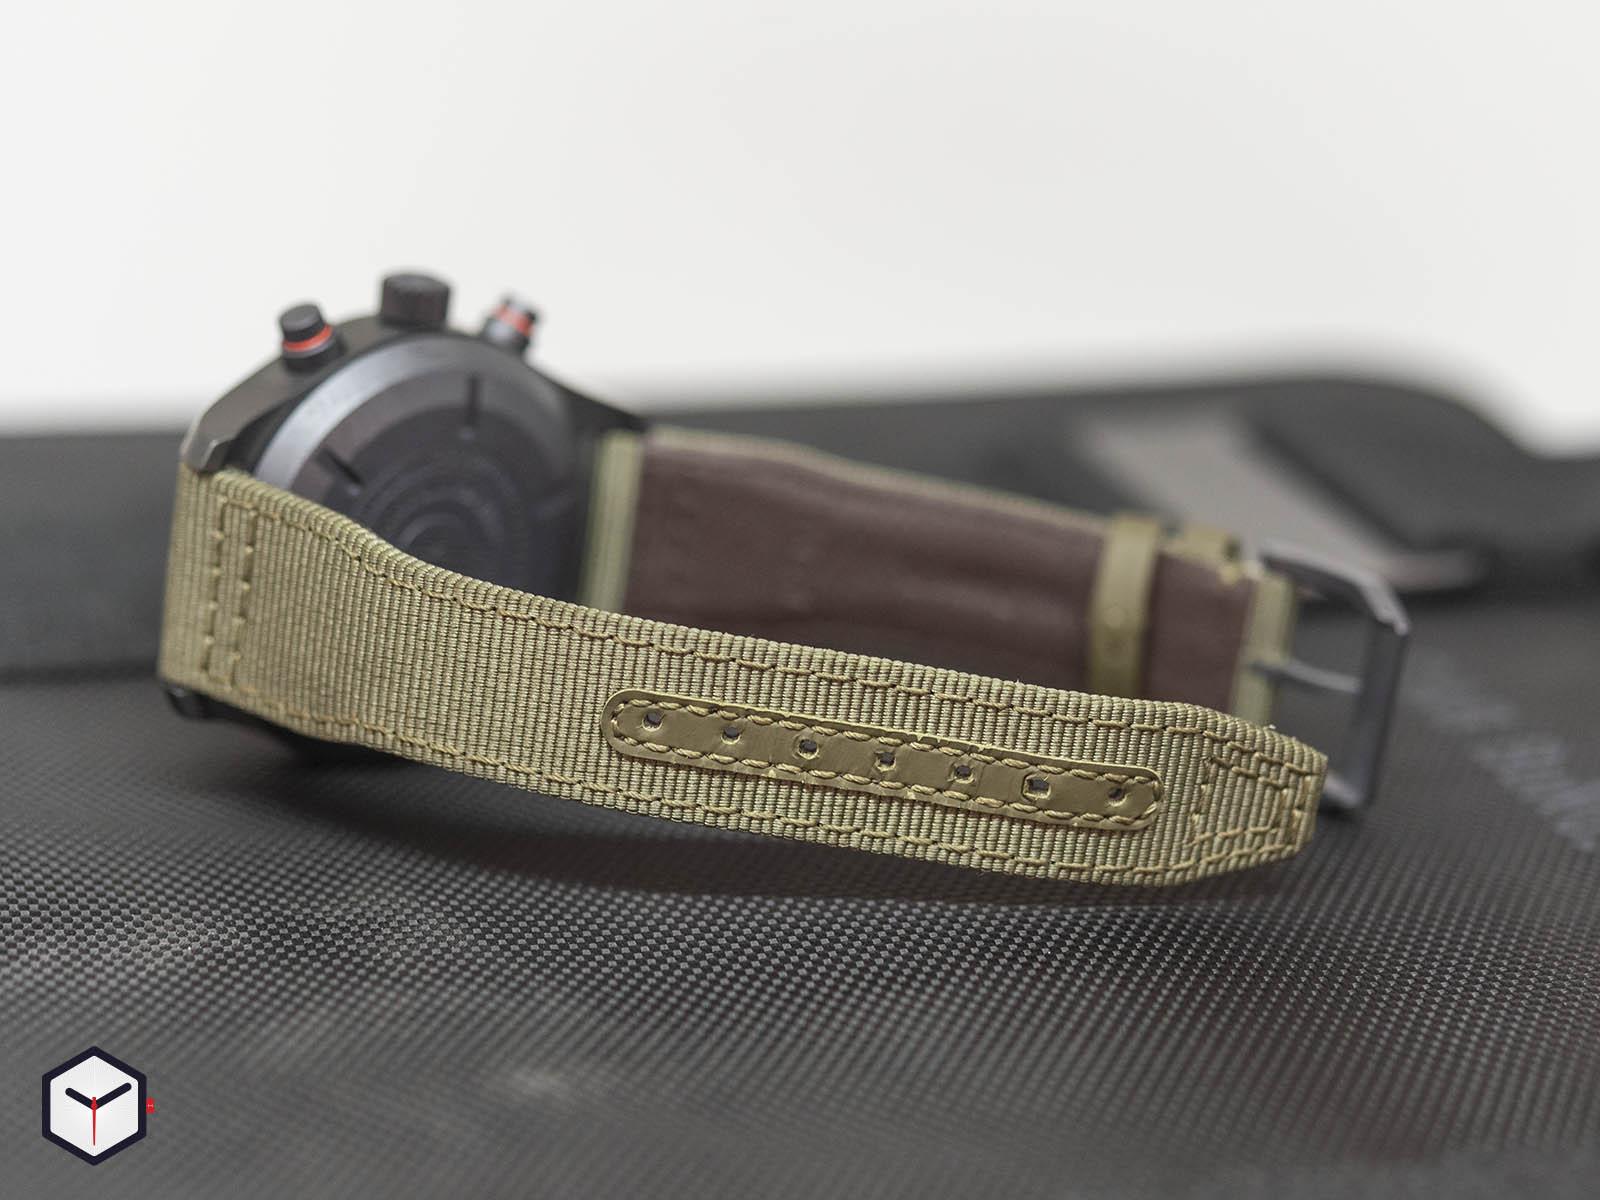 iw389104-iwc-top-gun-sfti-edition-5.jpg